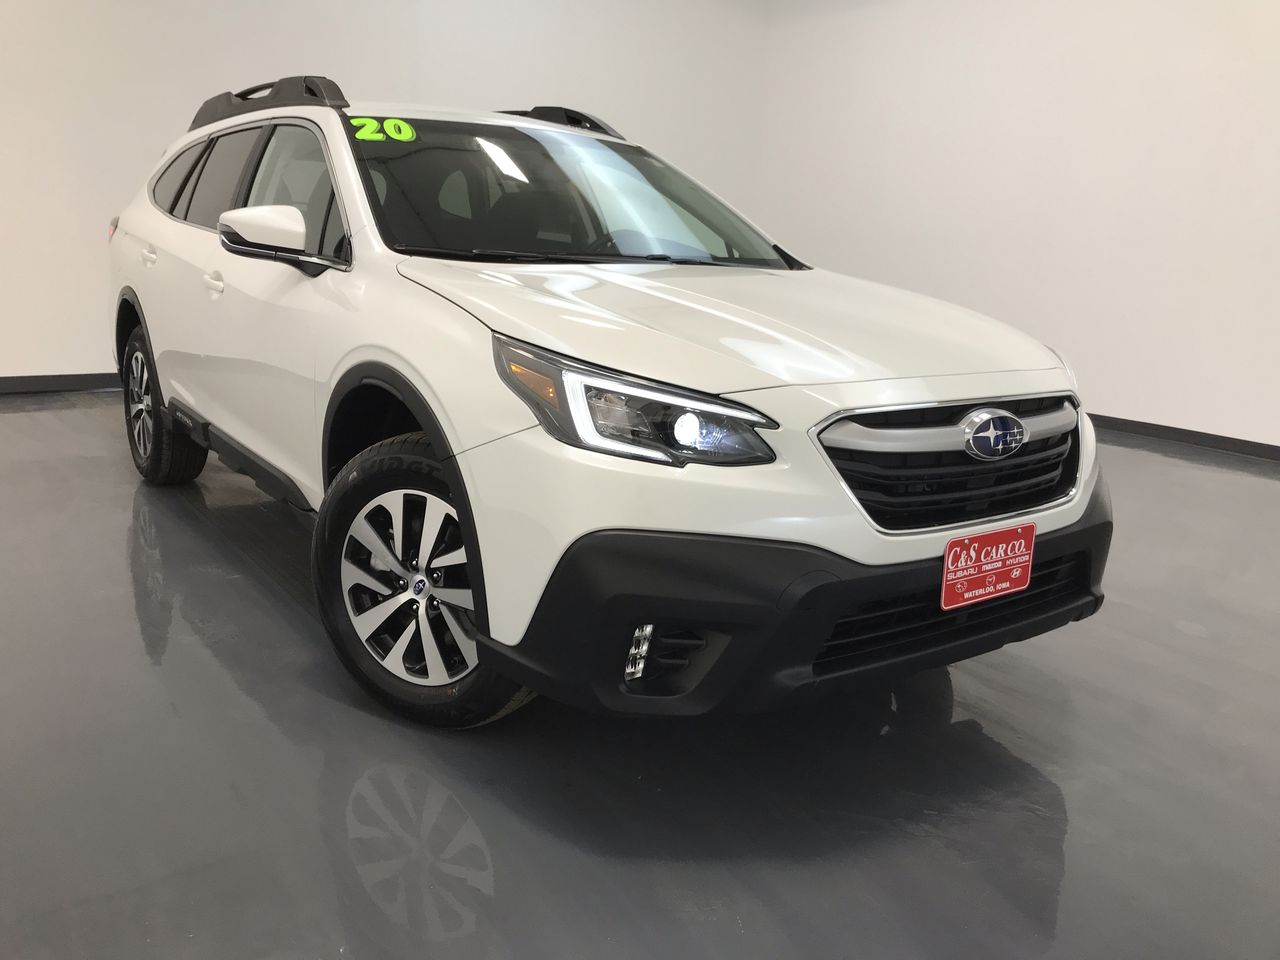 2020 Subaru Outback 2.5i Premium w/Eyesight  - SB8387  - C & S Car Company